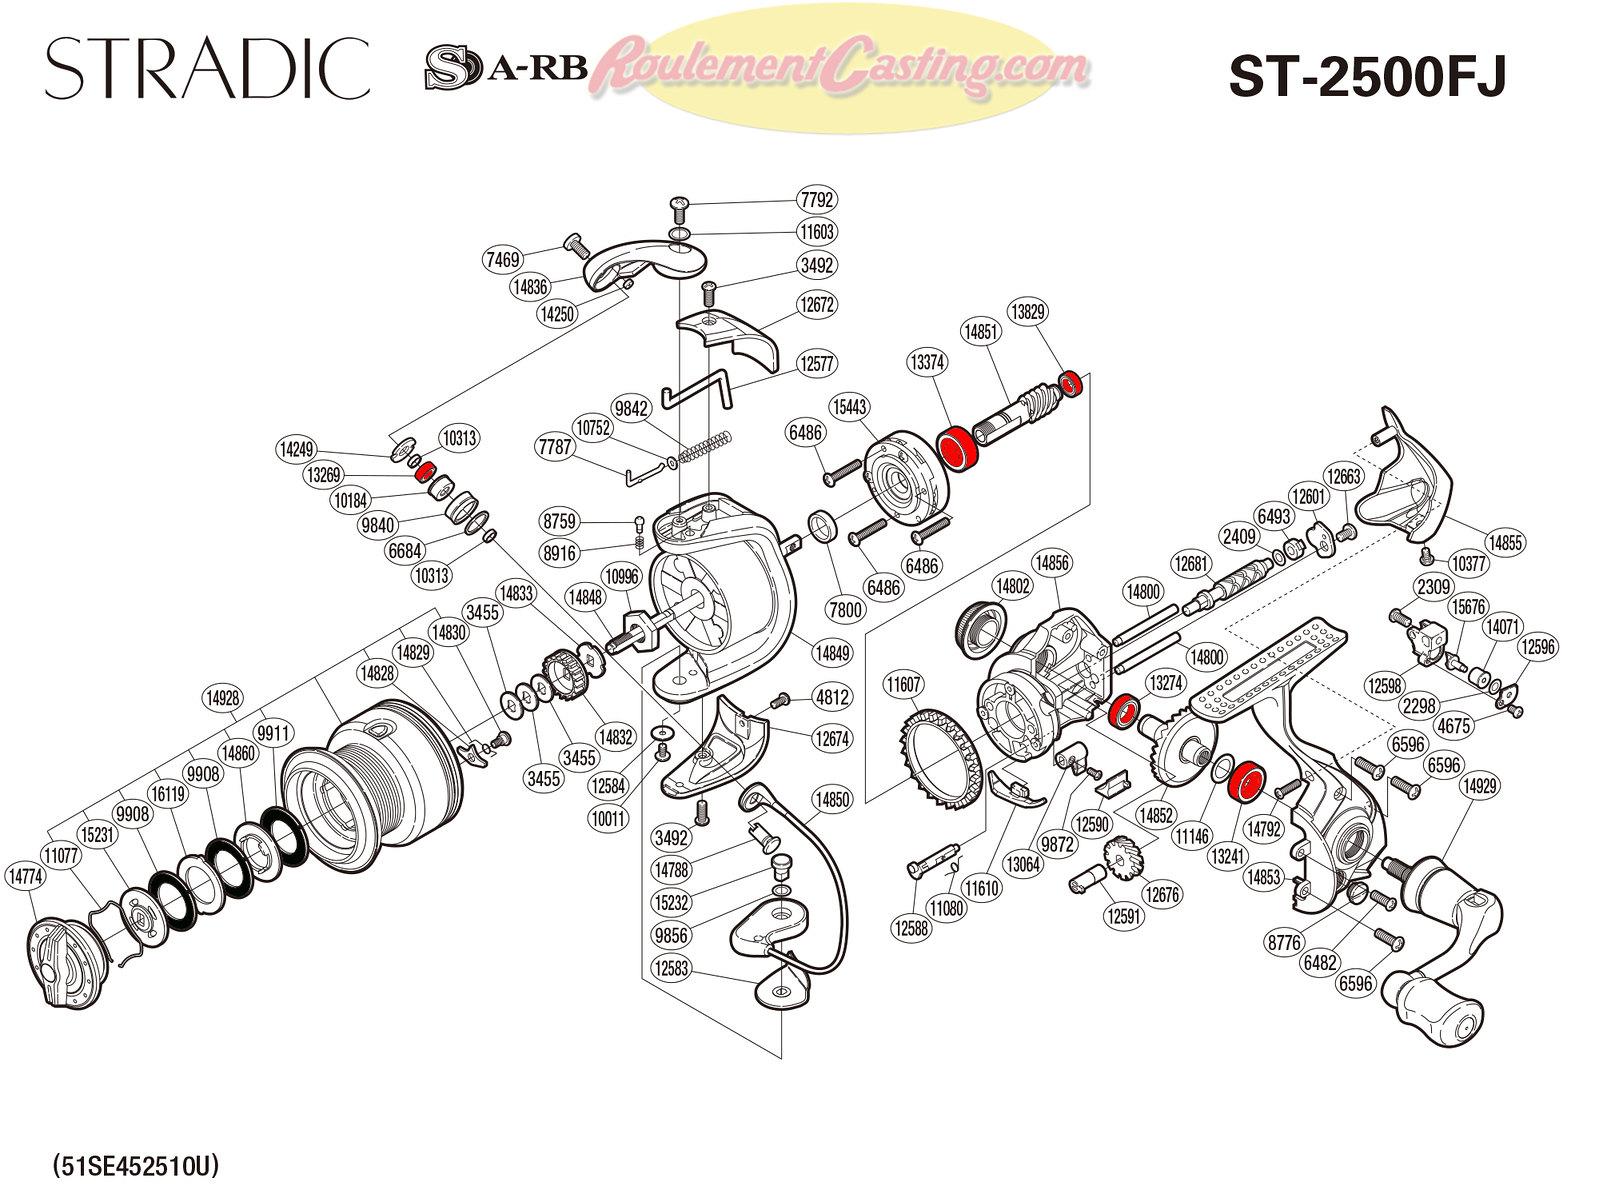 Schema-Stradic-2500FJ